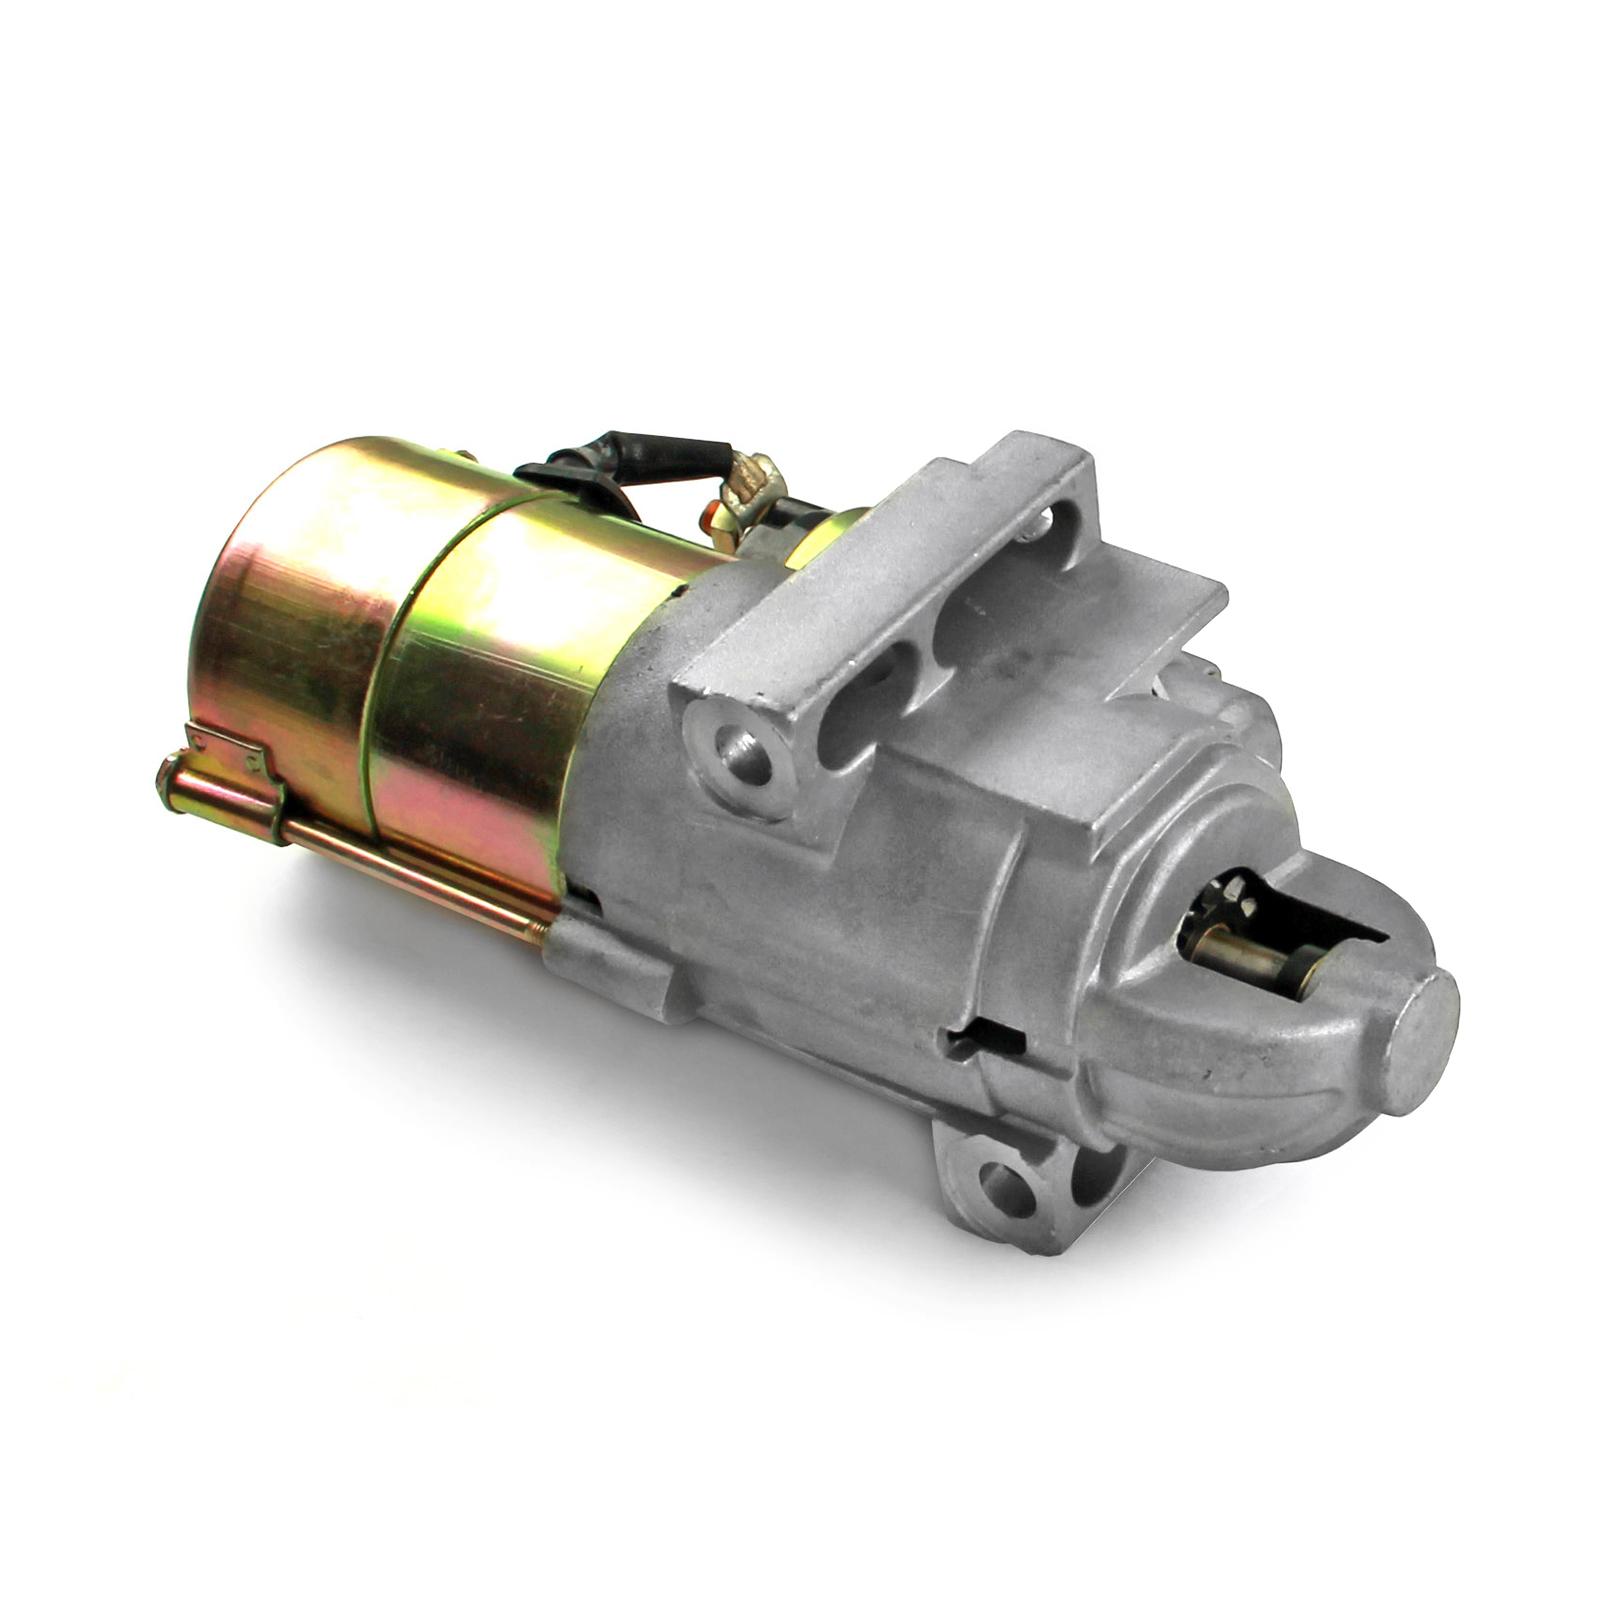 "Chevy SBC 350 BBC 454 11"" 168T Offset High Torque Starter Motor"